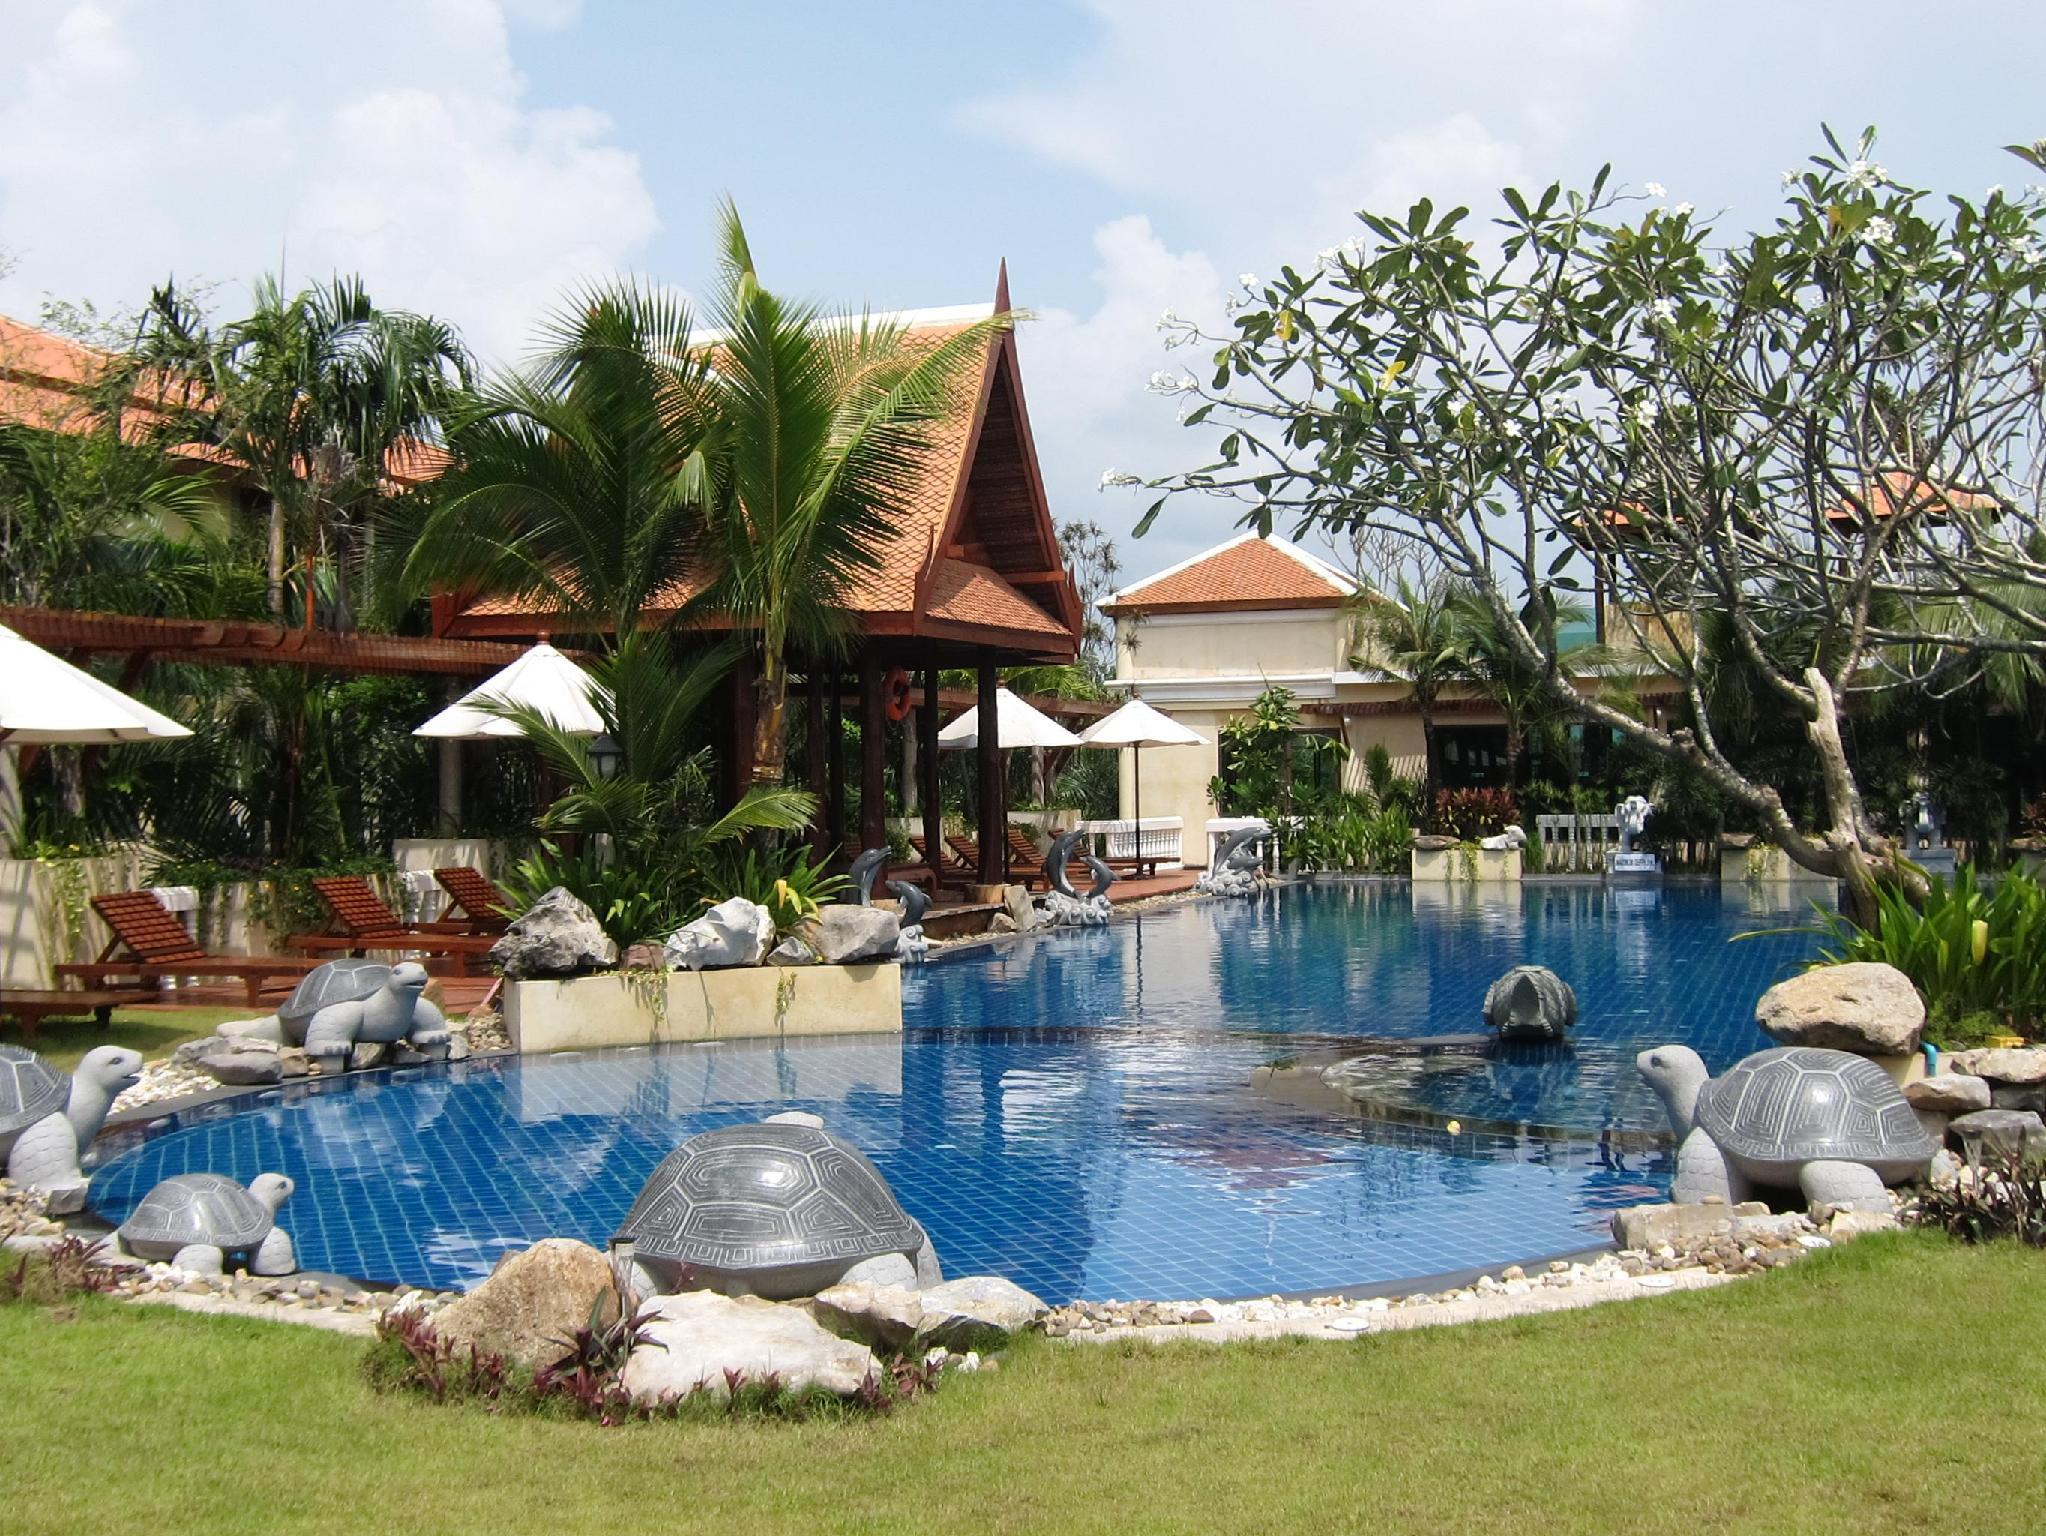 Mae Pim Resort Hotel แม่พิมพ์ รีสอร์ท โฮเต็ล